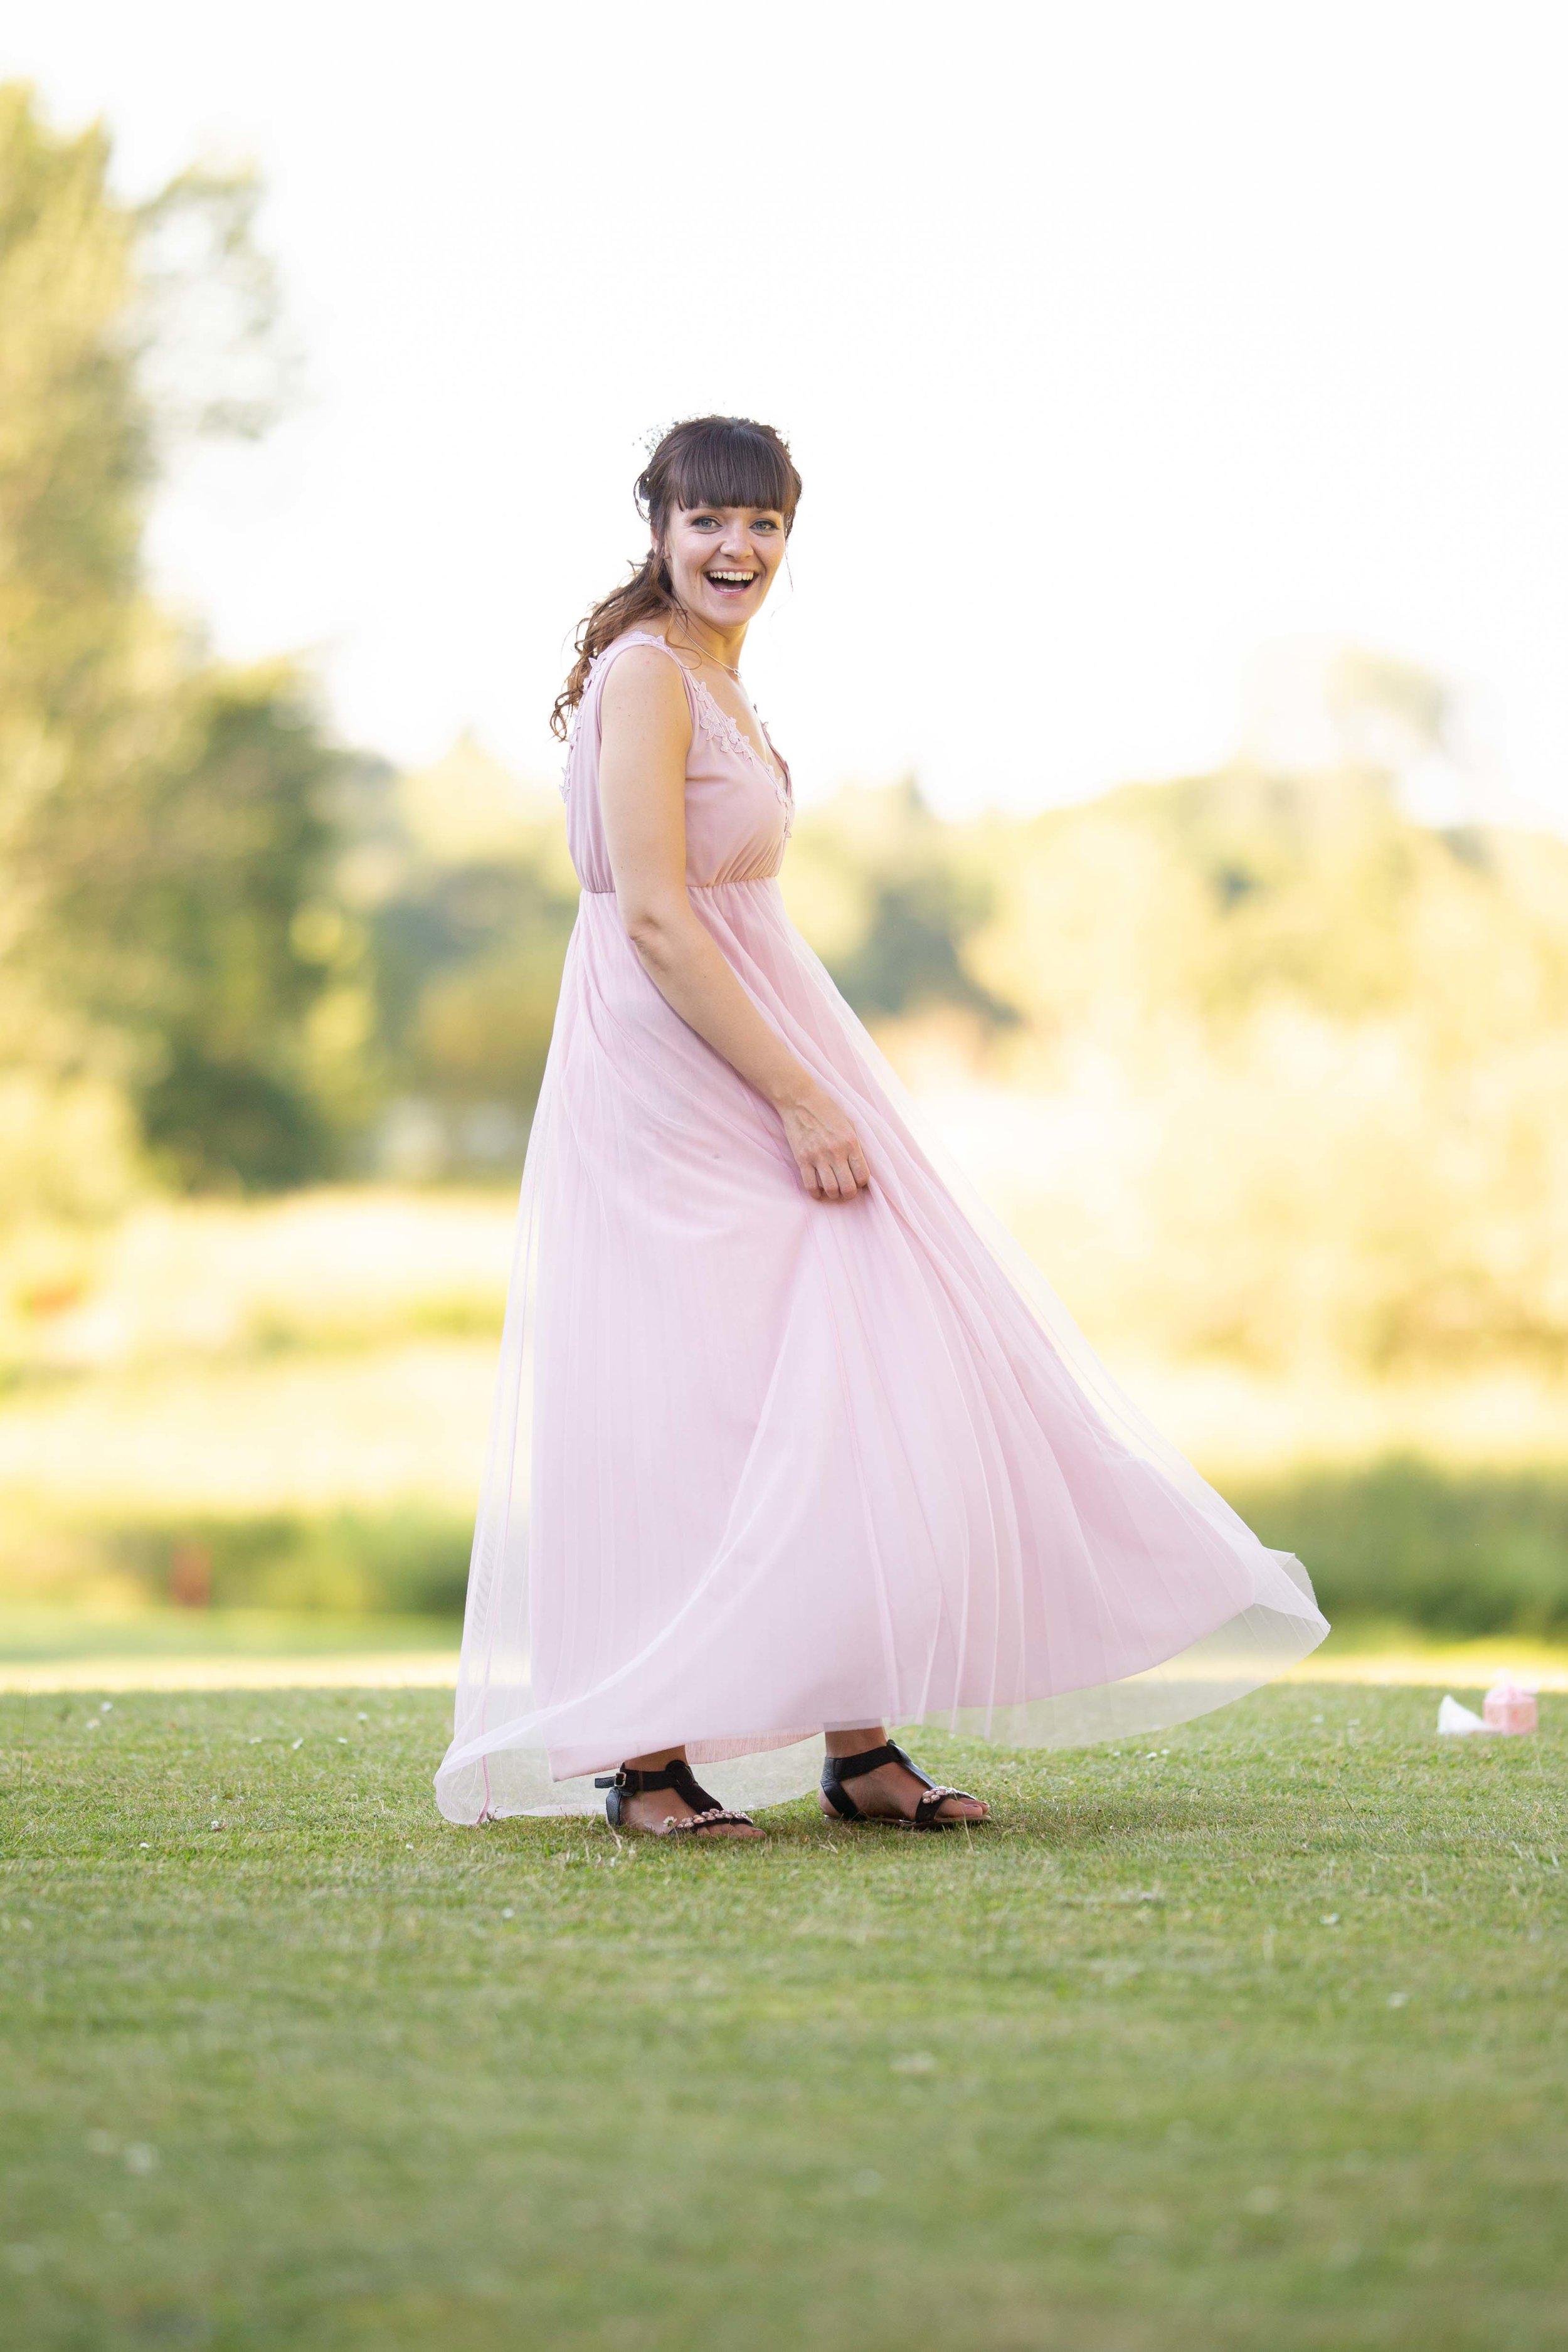 Lea-cooper-photography-wedding-photography-wolverhampton-patshull-park-hotel-wedding-pattingham-wolverhampton-west-midlands-uk-32.JPG